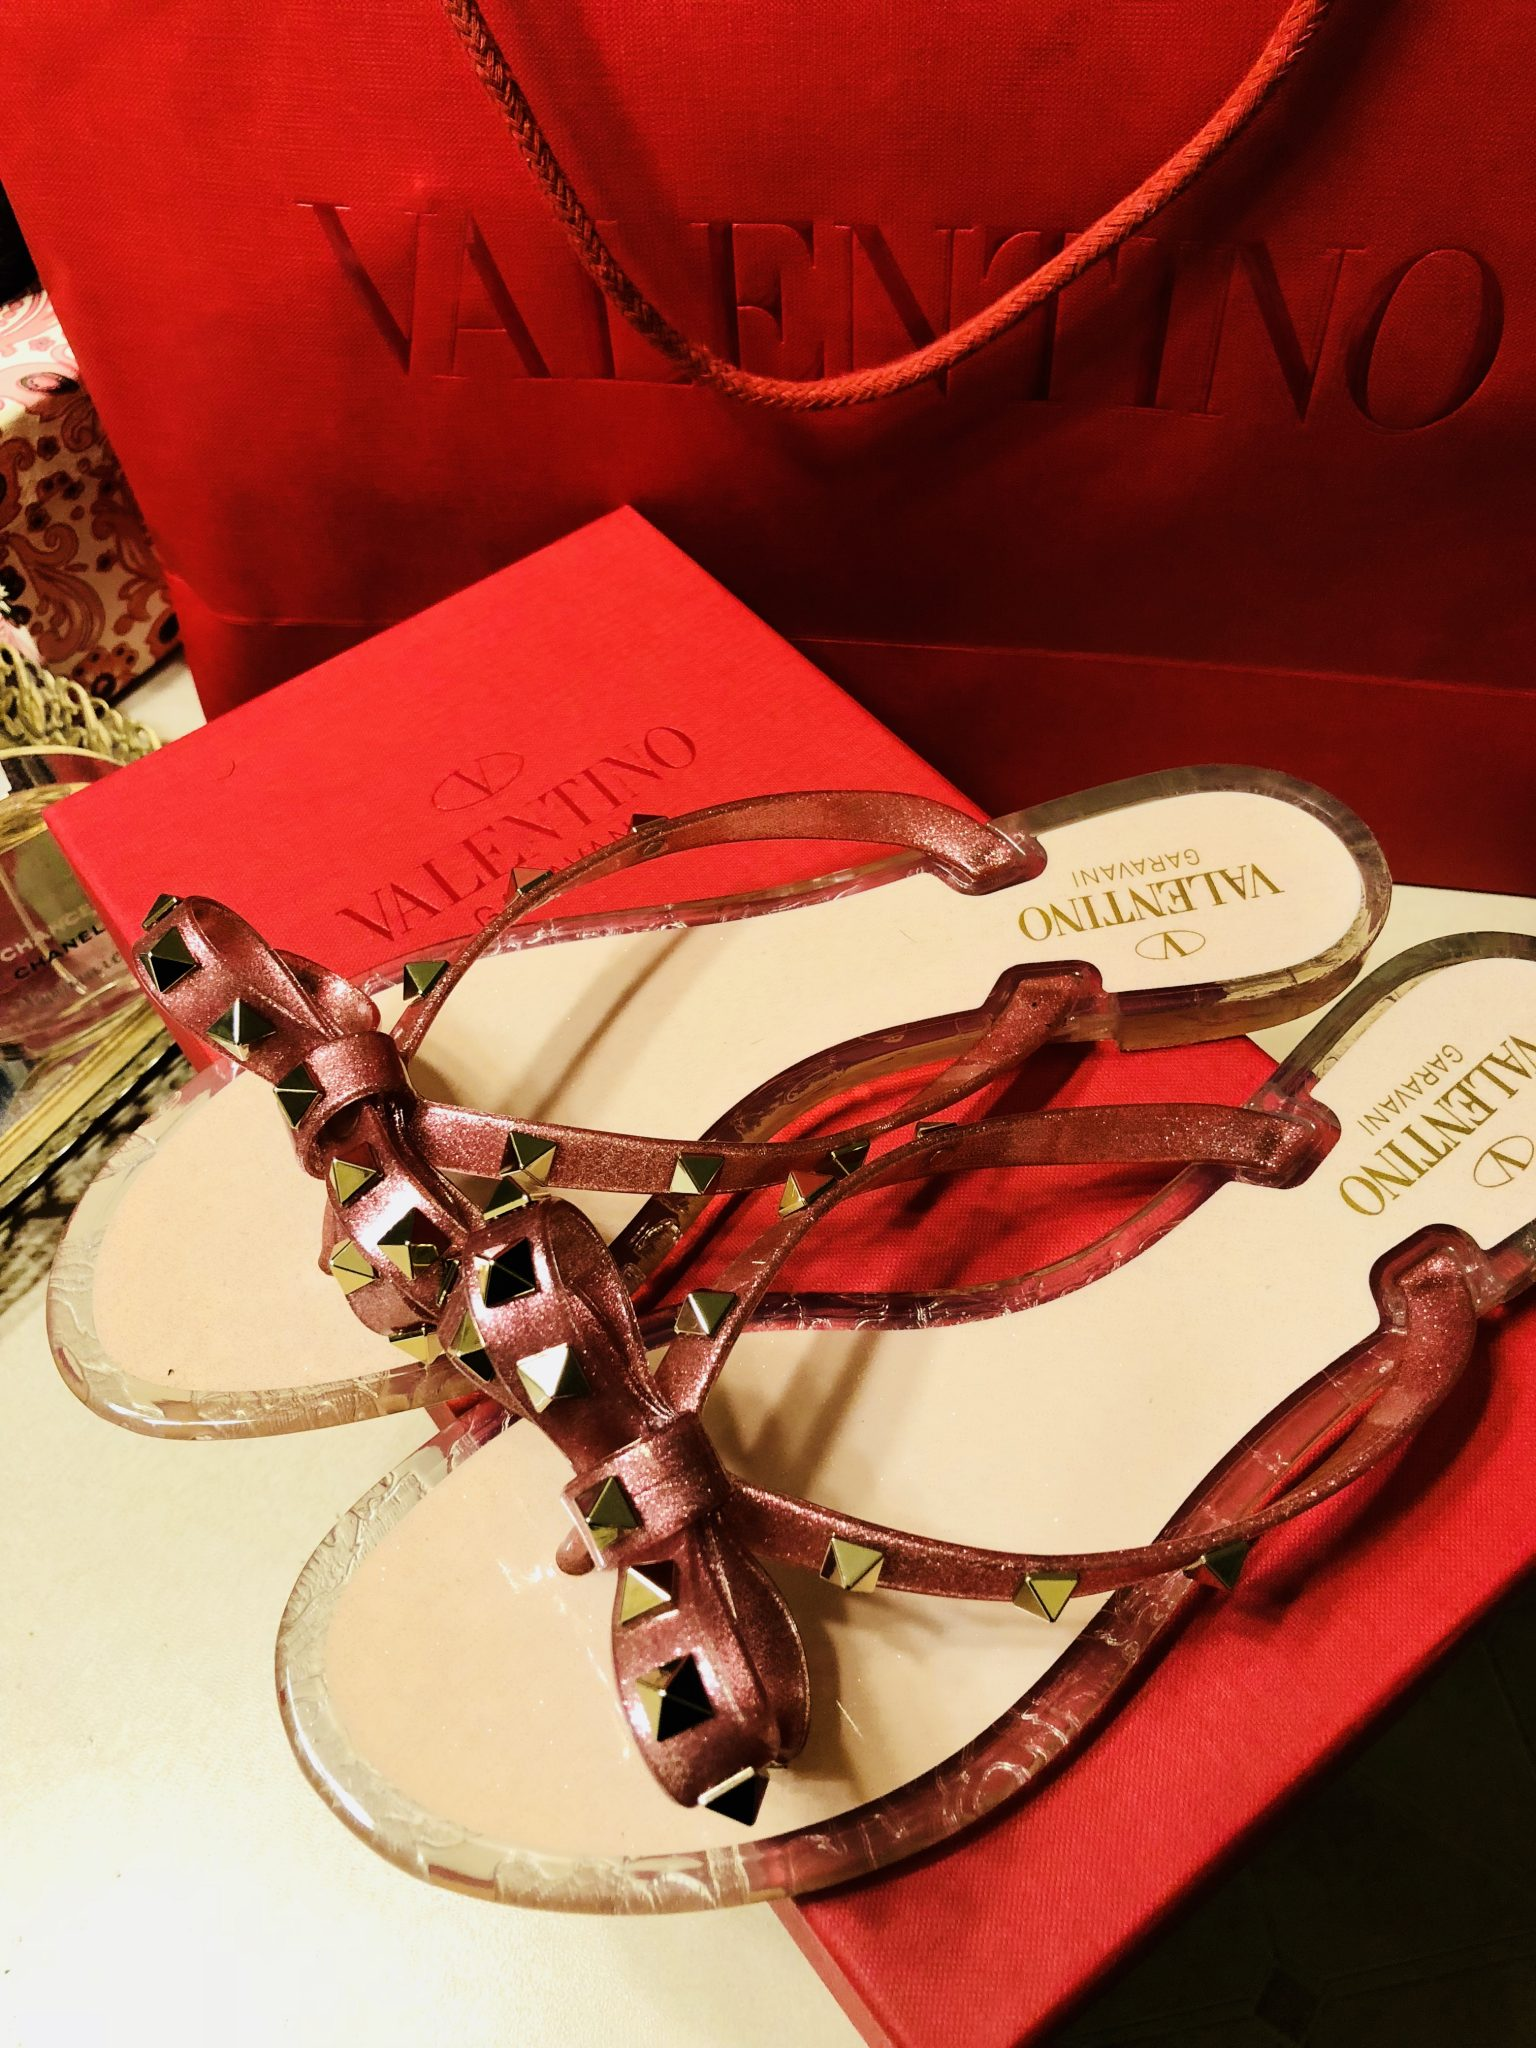 Cutest Summer Sandal: Valentino Garavani Rockstud Bow Flip Flop Sandals